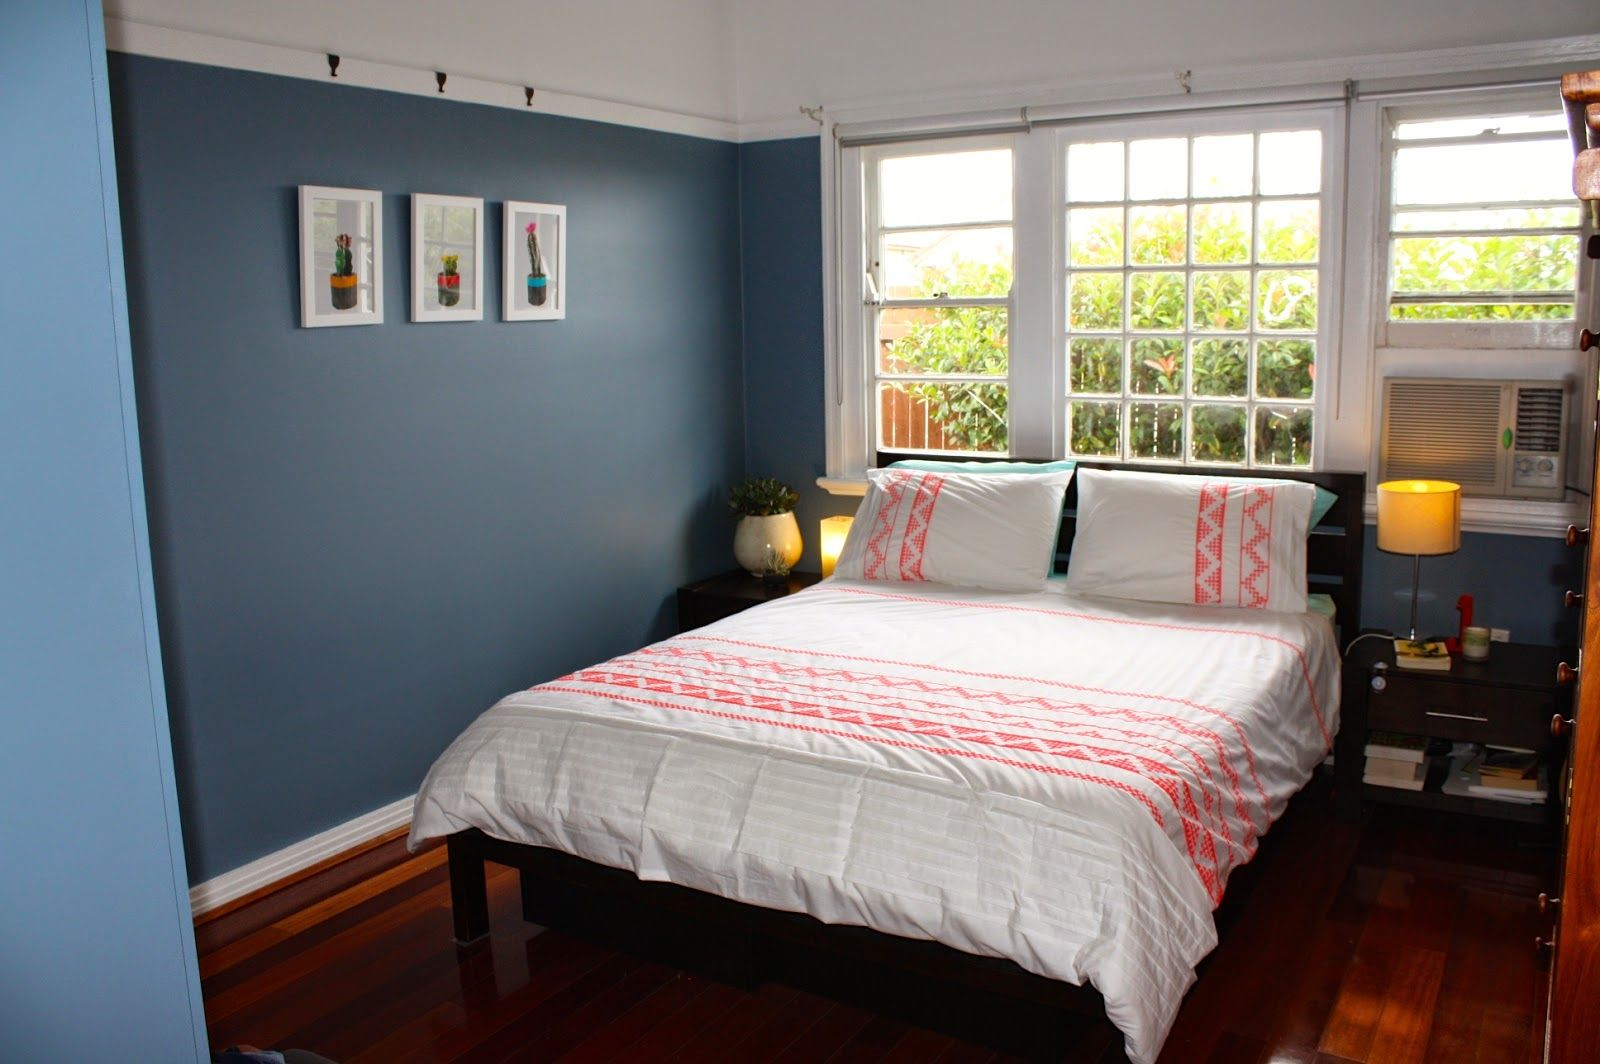 Master Bedroom Renovation Peachy Keen Mumma Blog Master Bedroom Renovation In Dulux